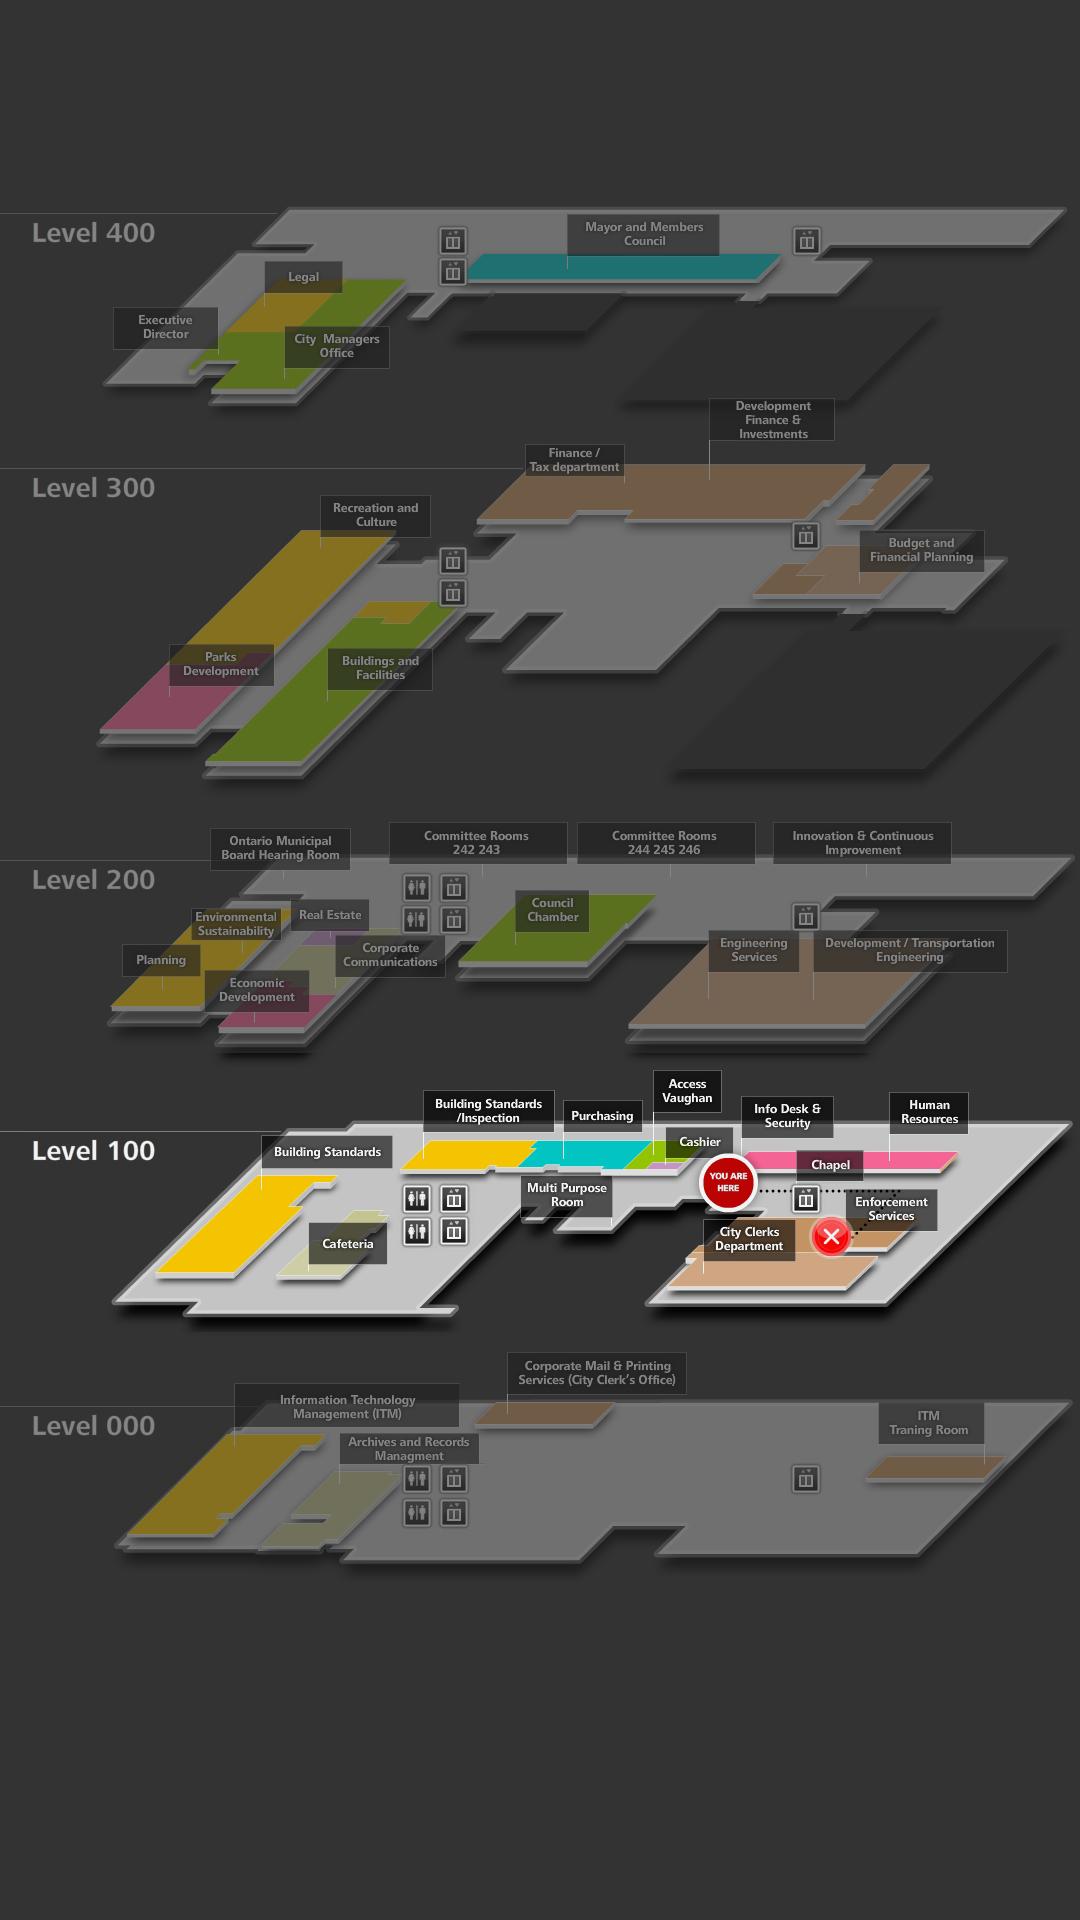 001-Enforcment Services.jpg